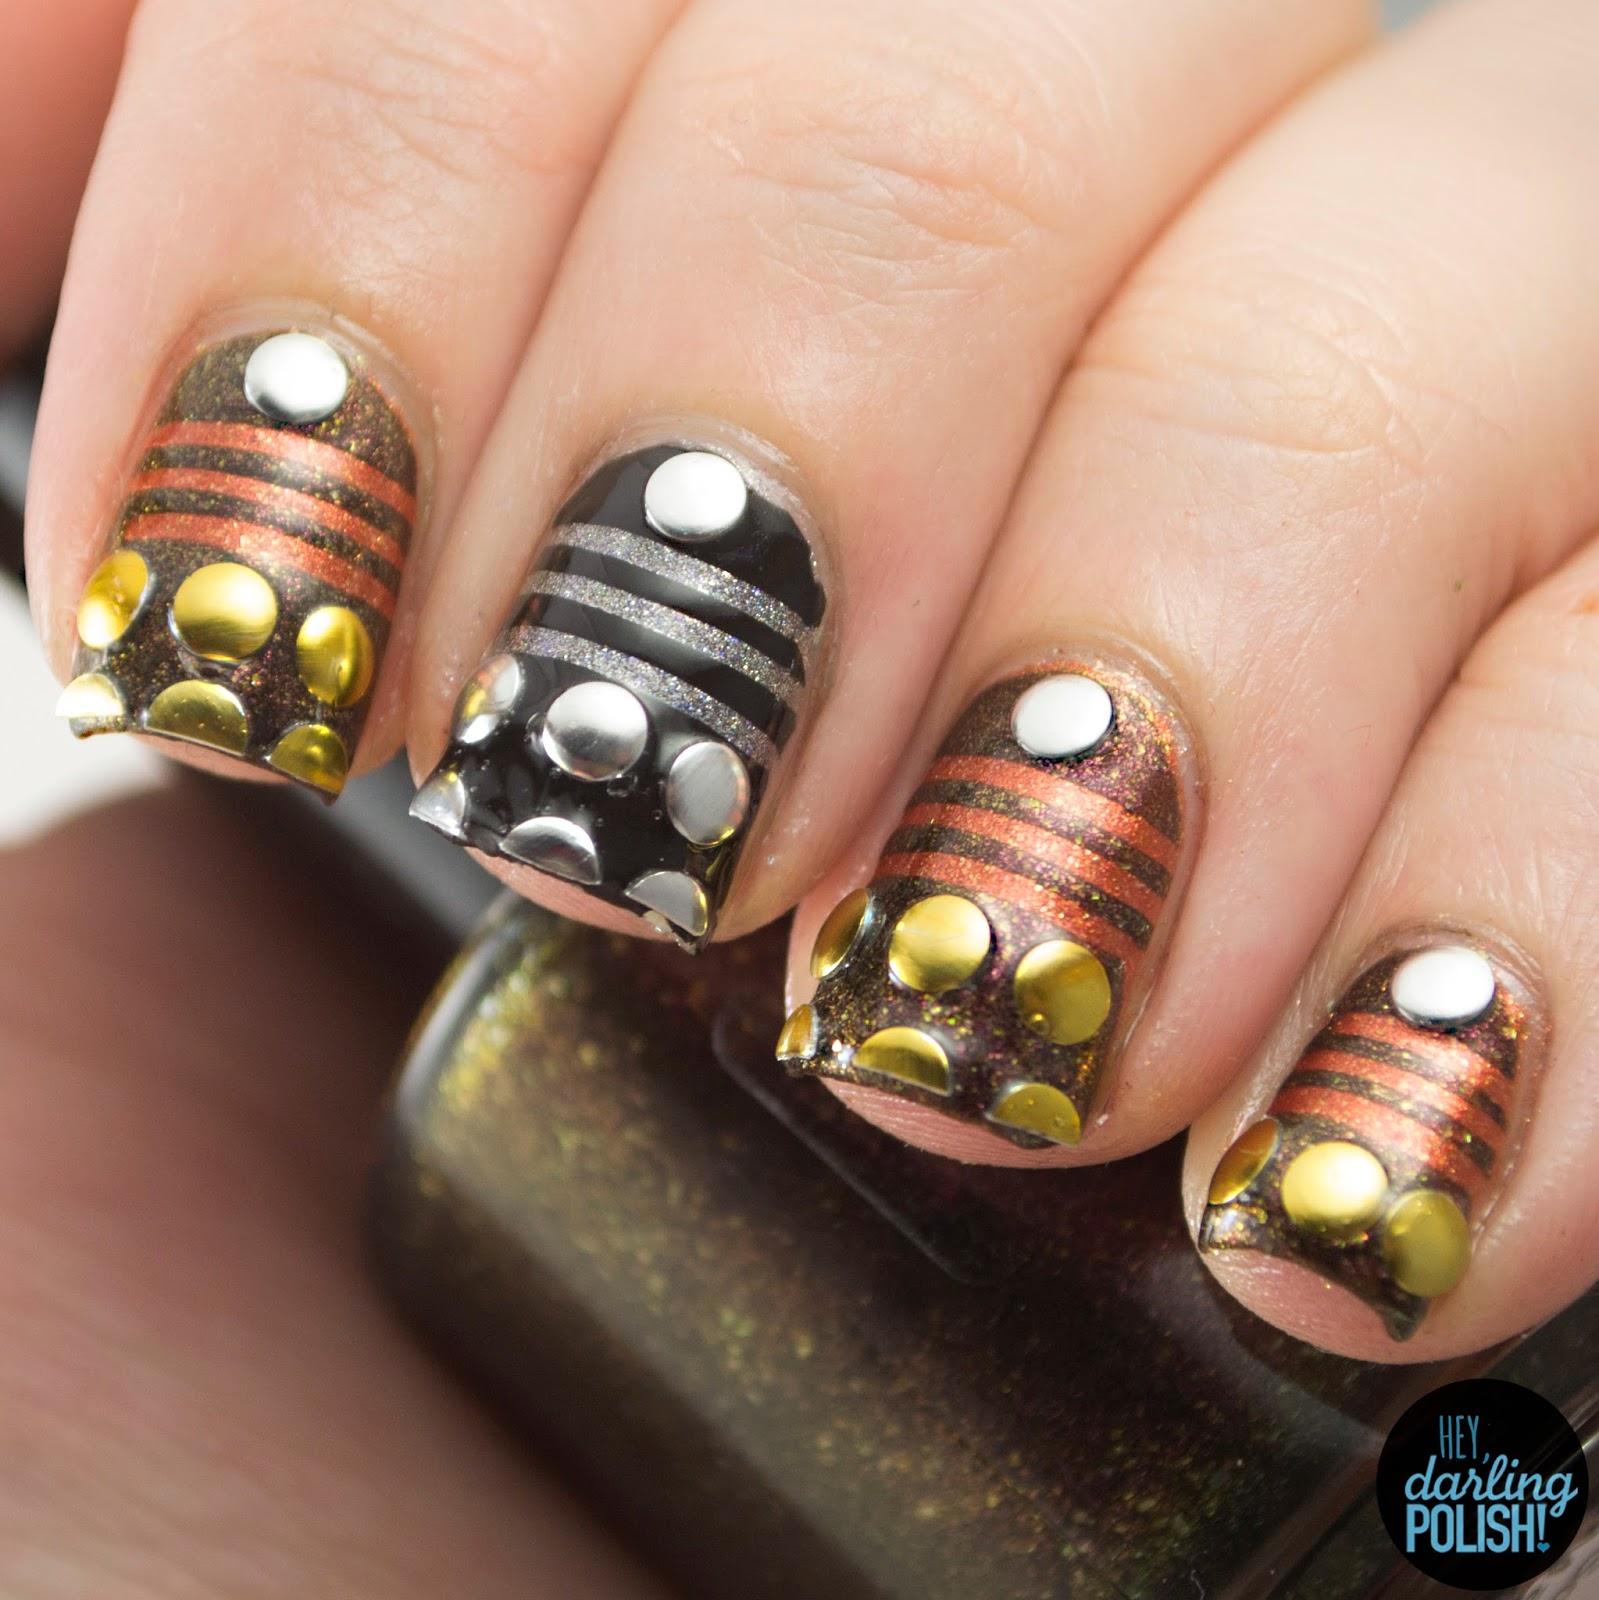 nails, nail polish, nail art, polish, pahlish, doctor who, daleks, sci fi, hey darling polish, nail art a go go